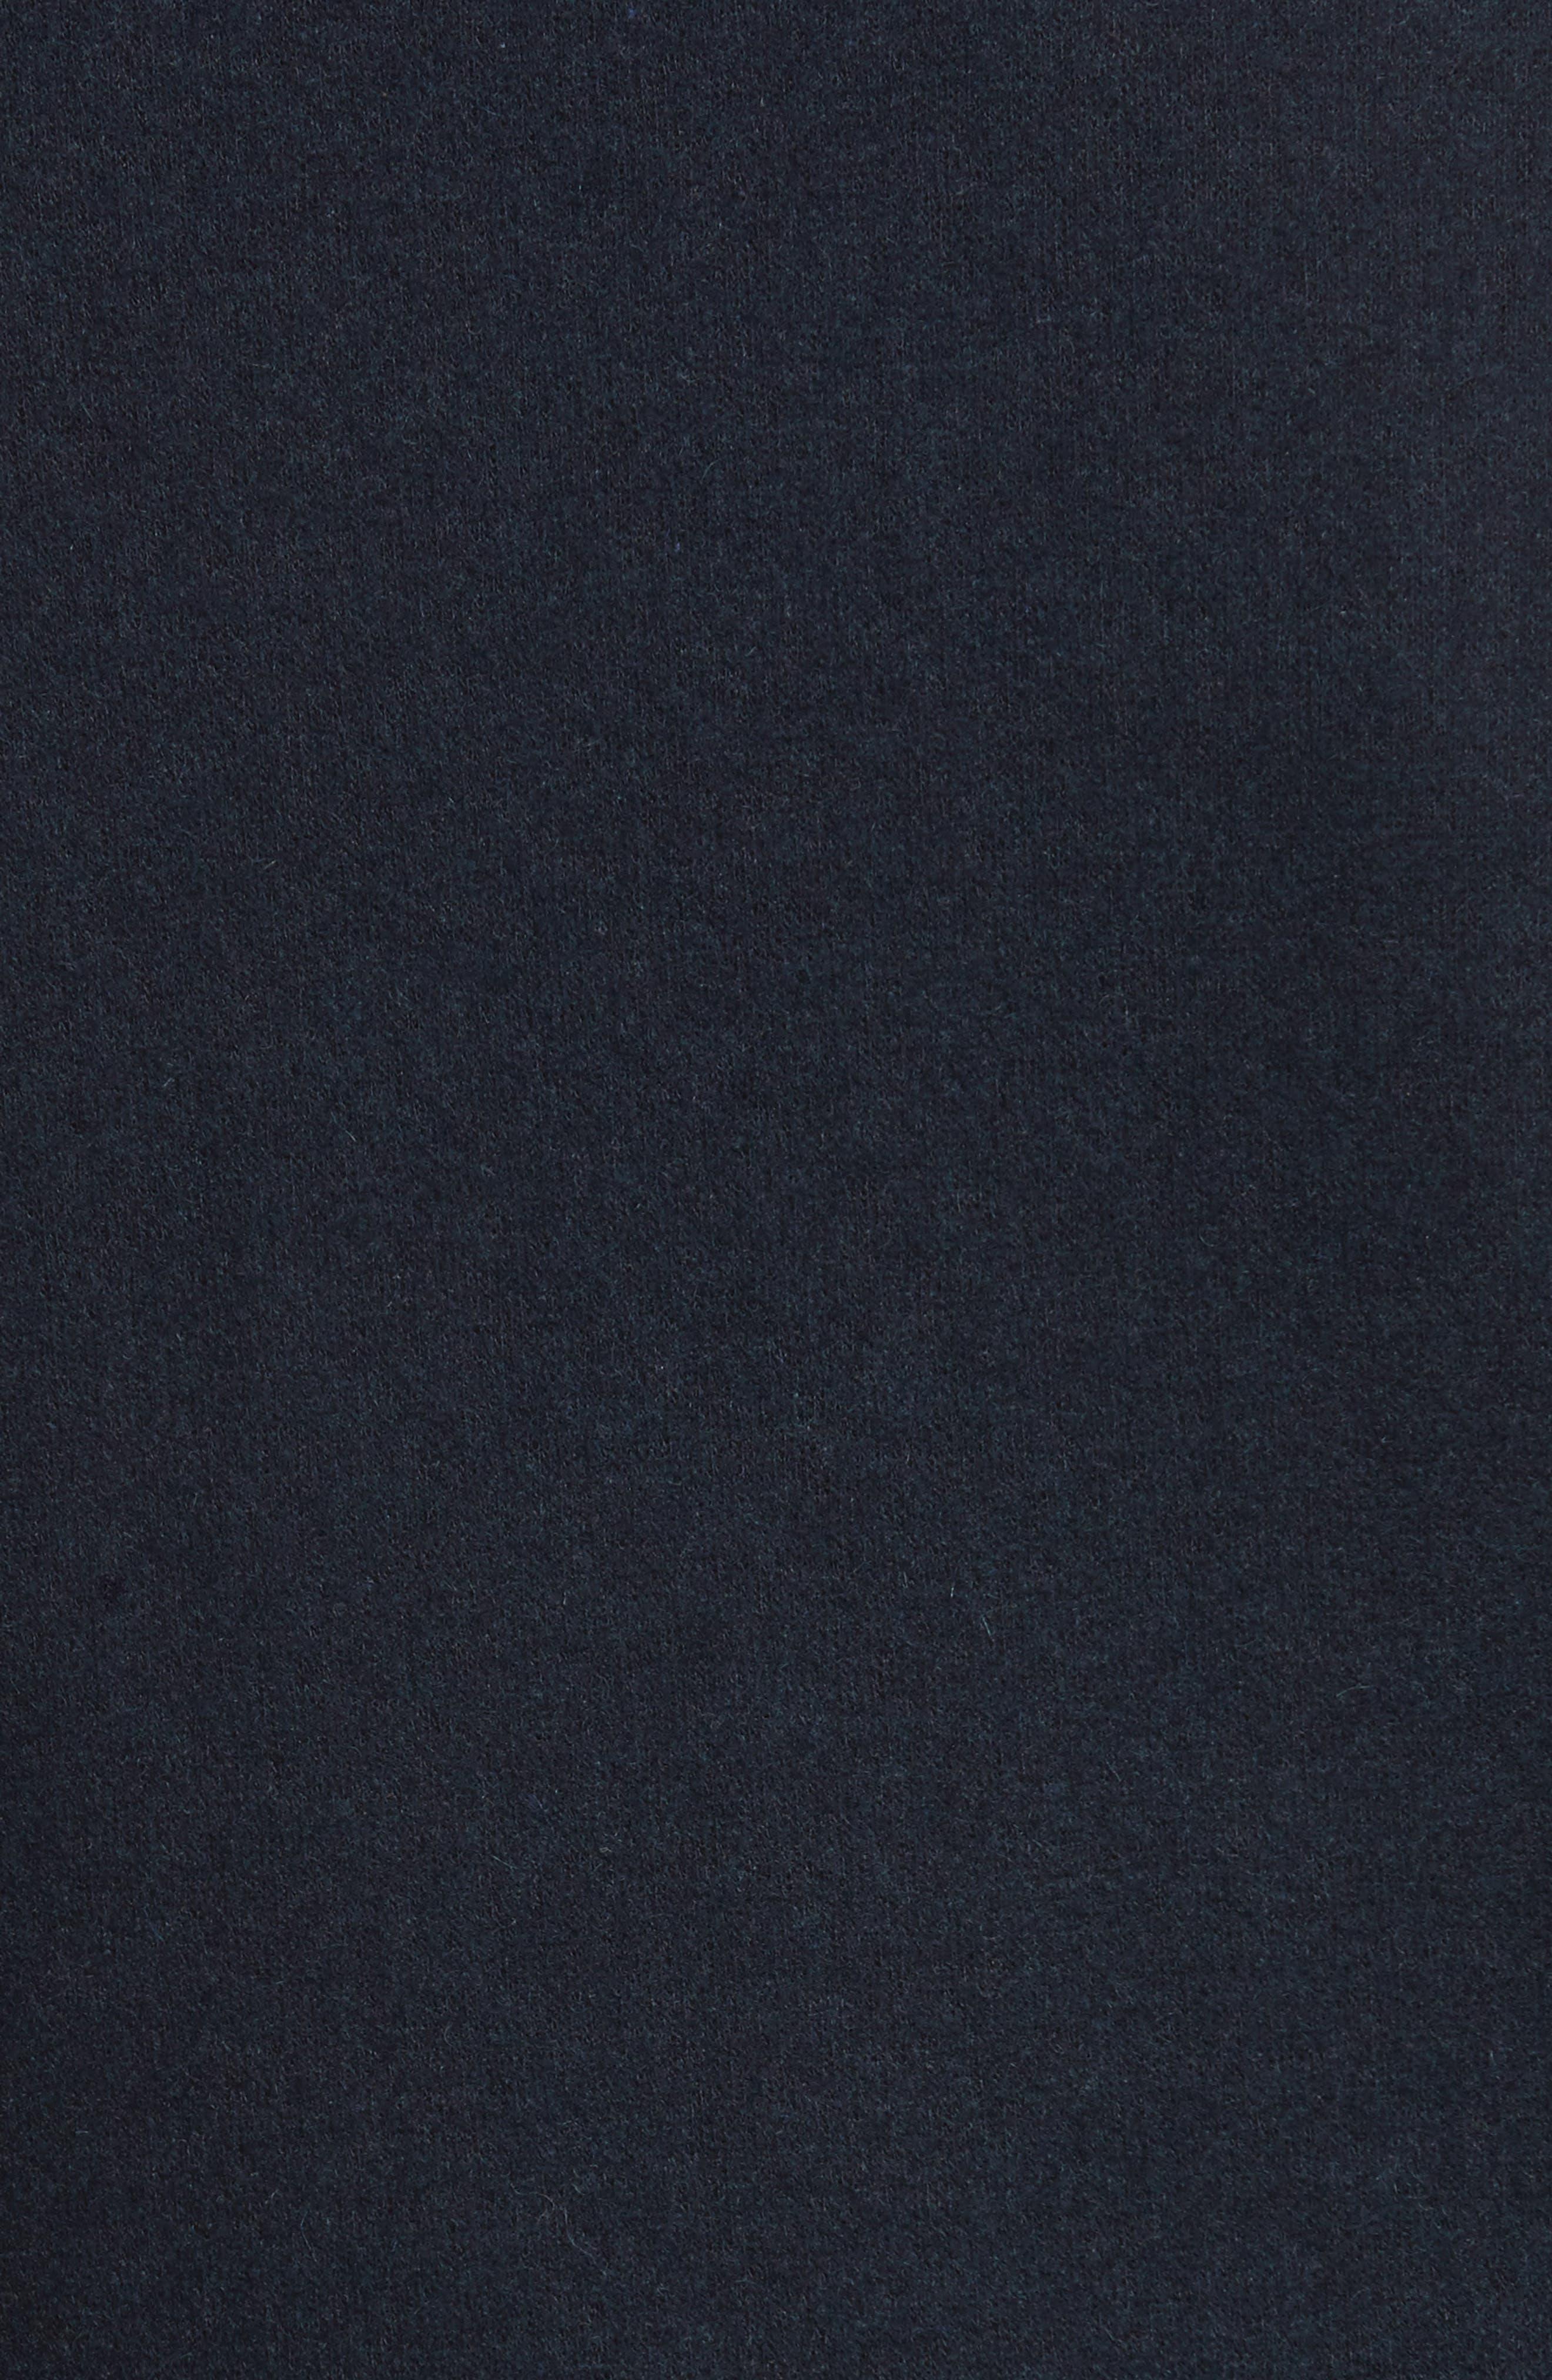 Aeolia Bell Sleeve Jacket,                             Alternate thumbnail 6, color,                             418